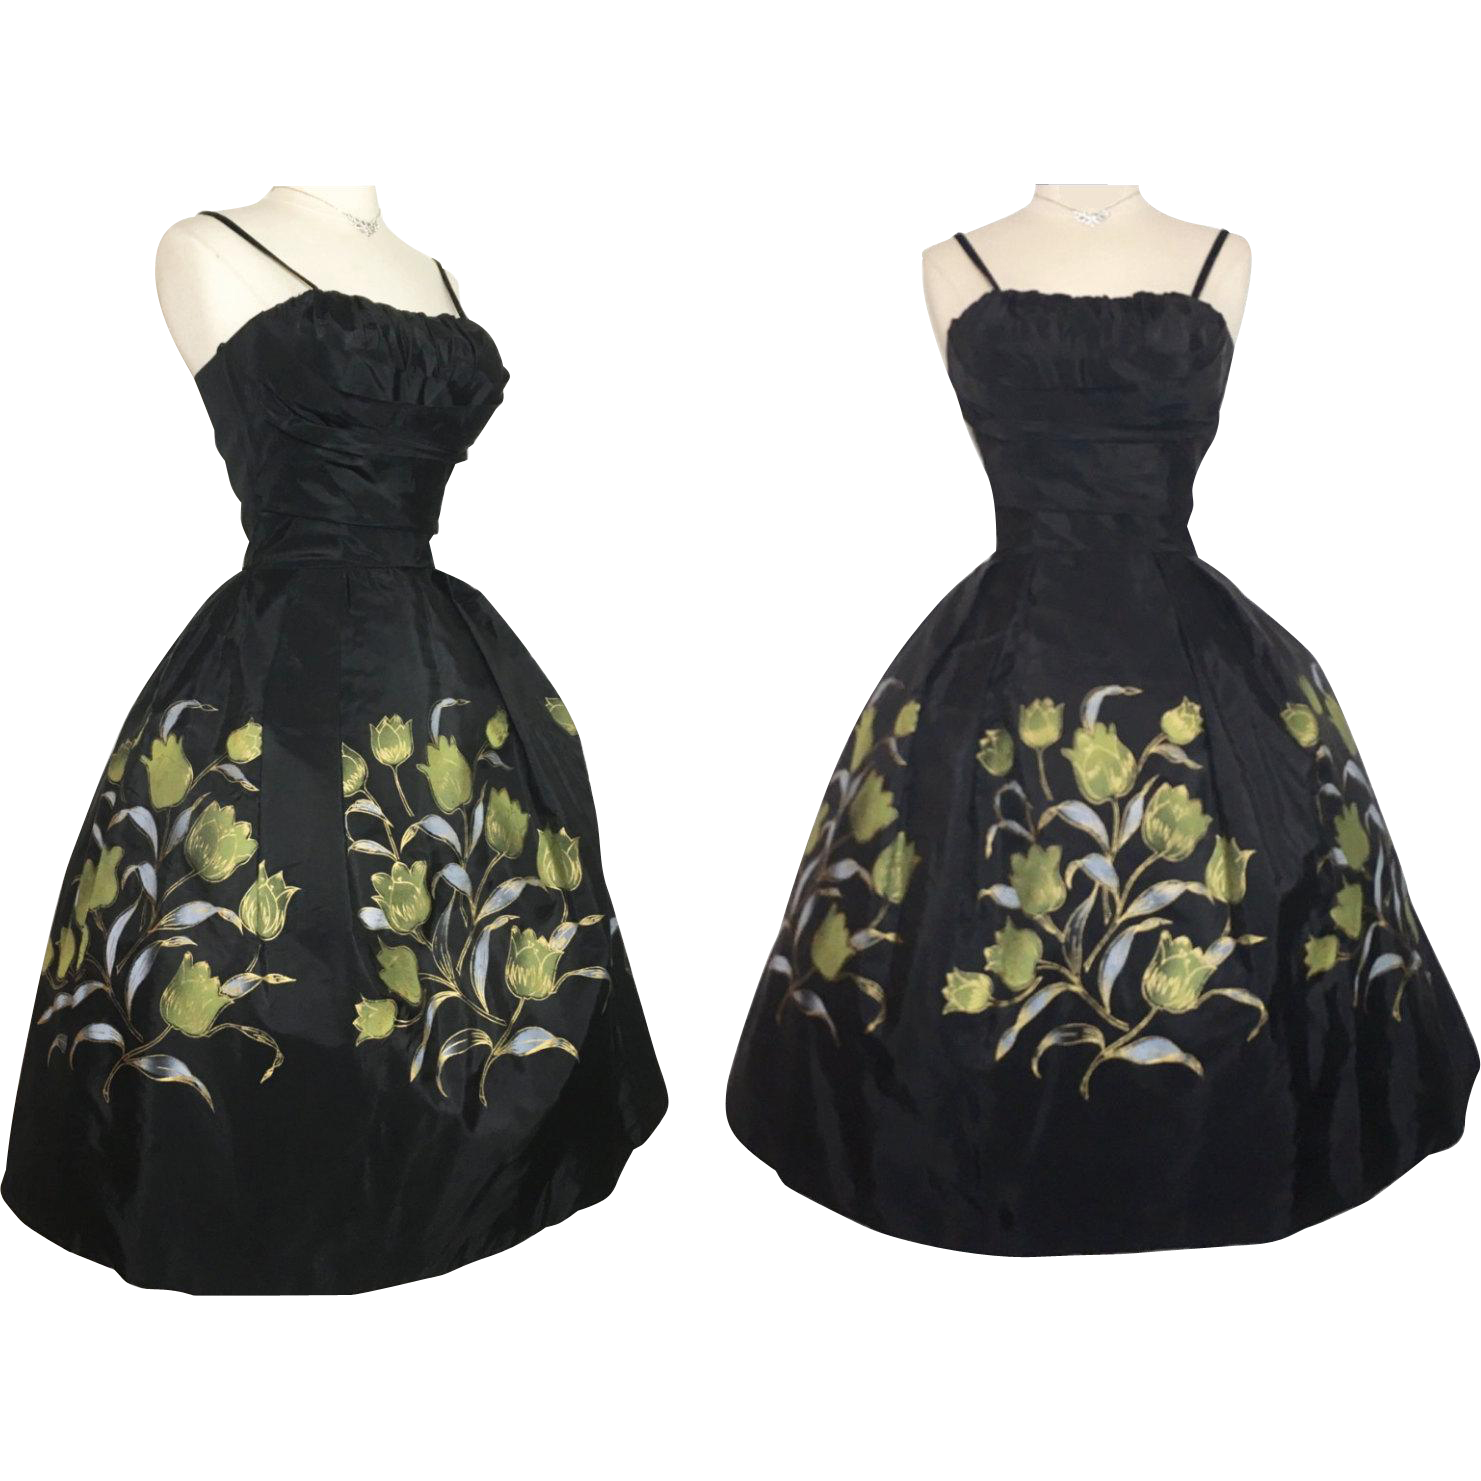 Vintage 1950s Dress 50 Floral Rockabilly Full Circle